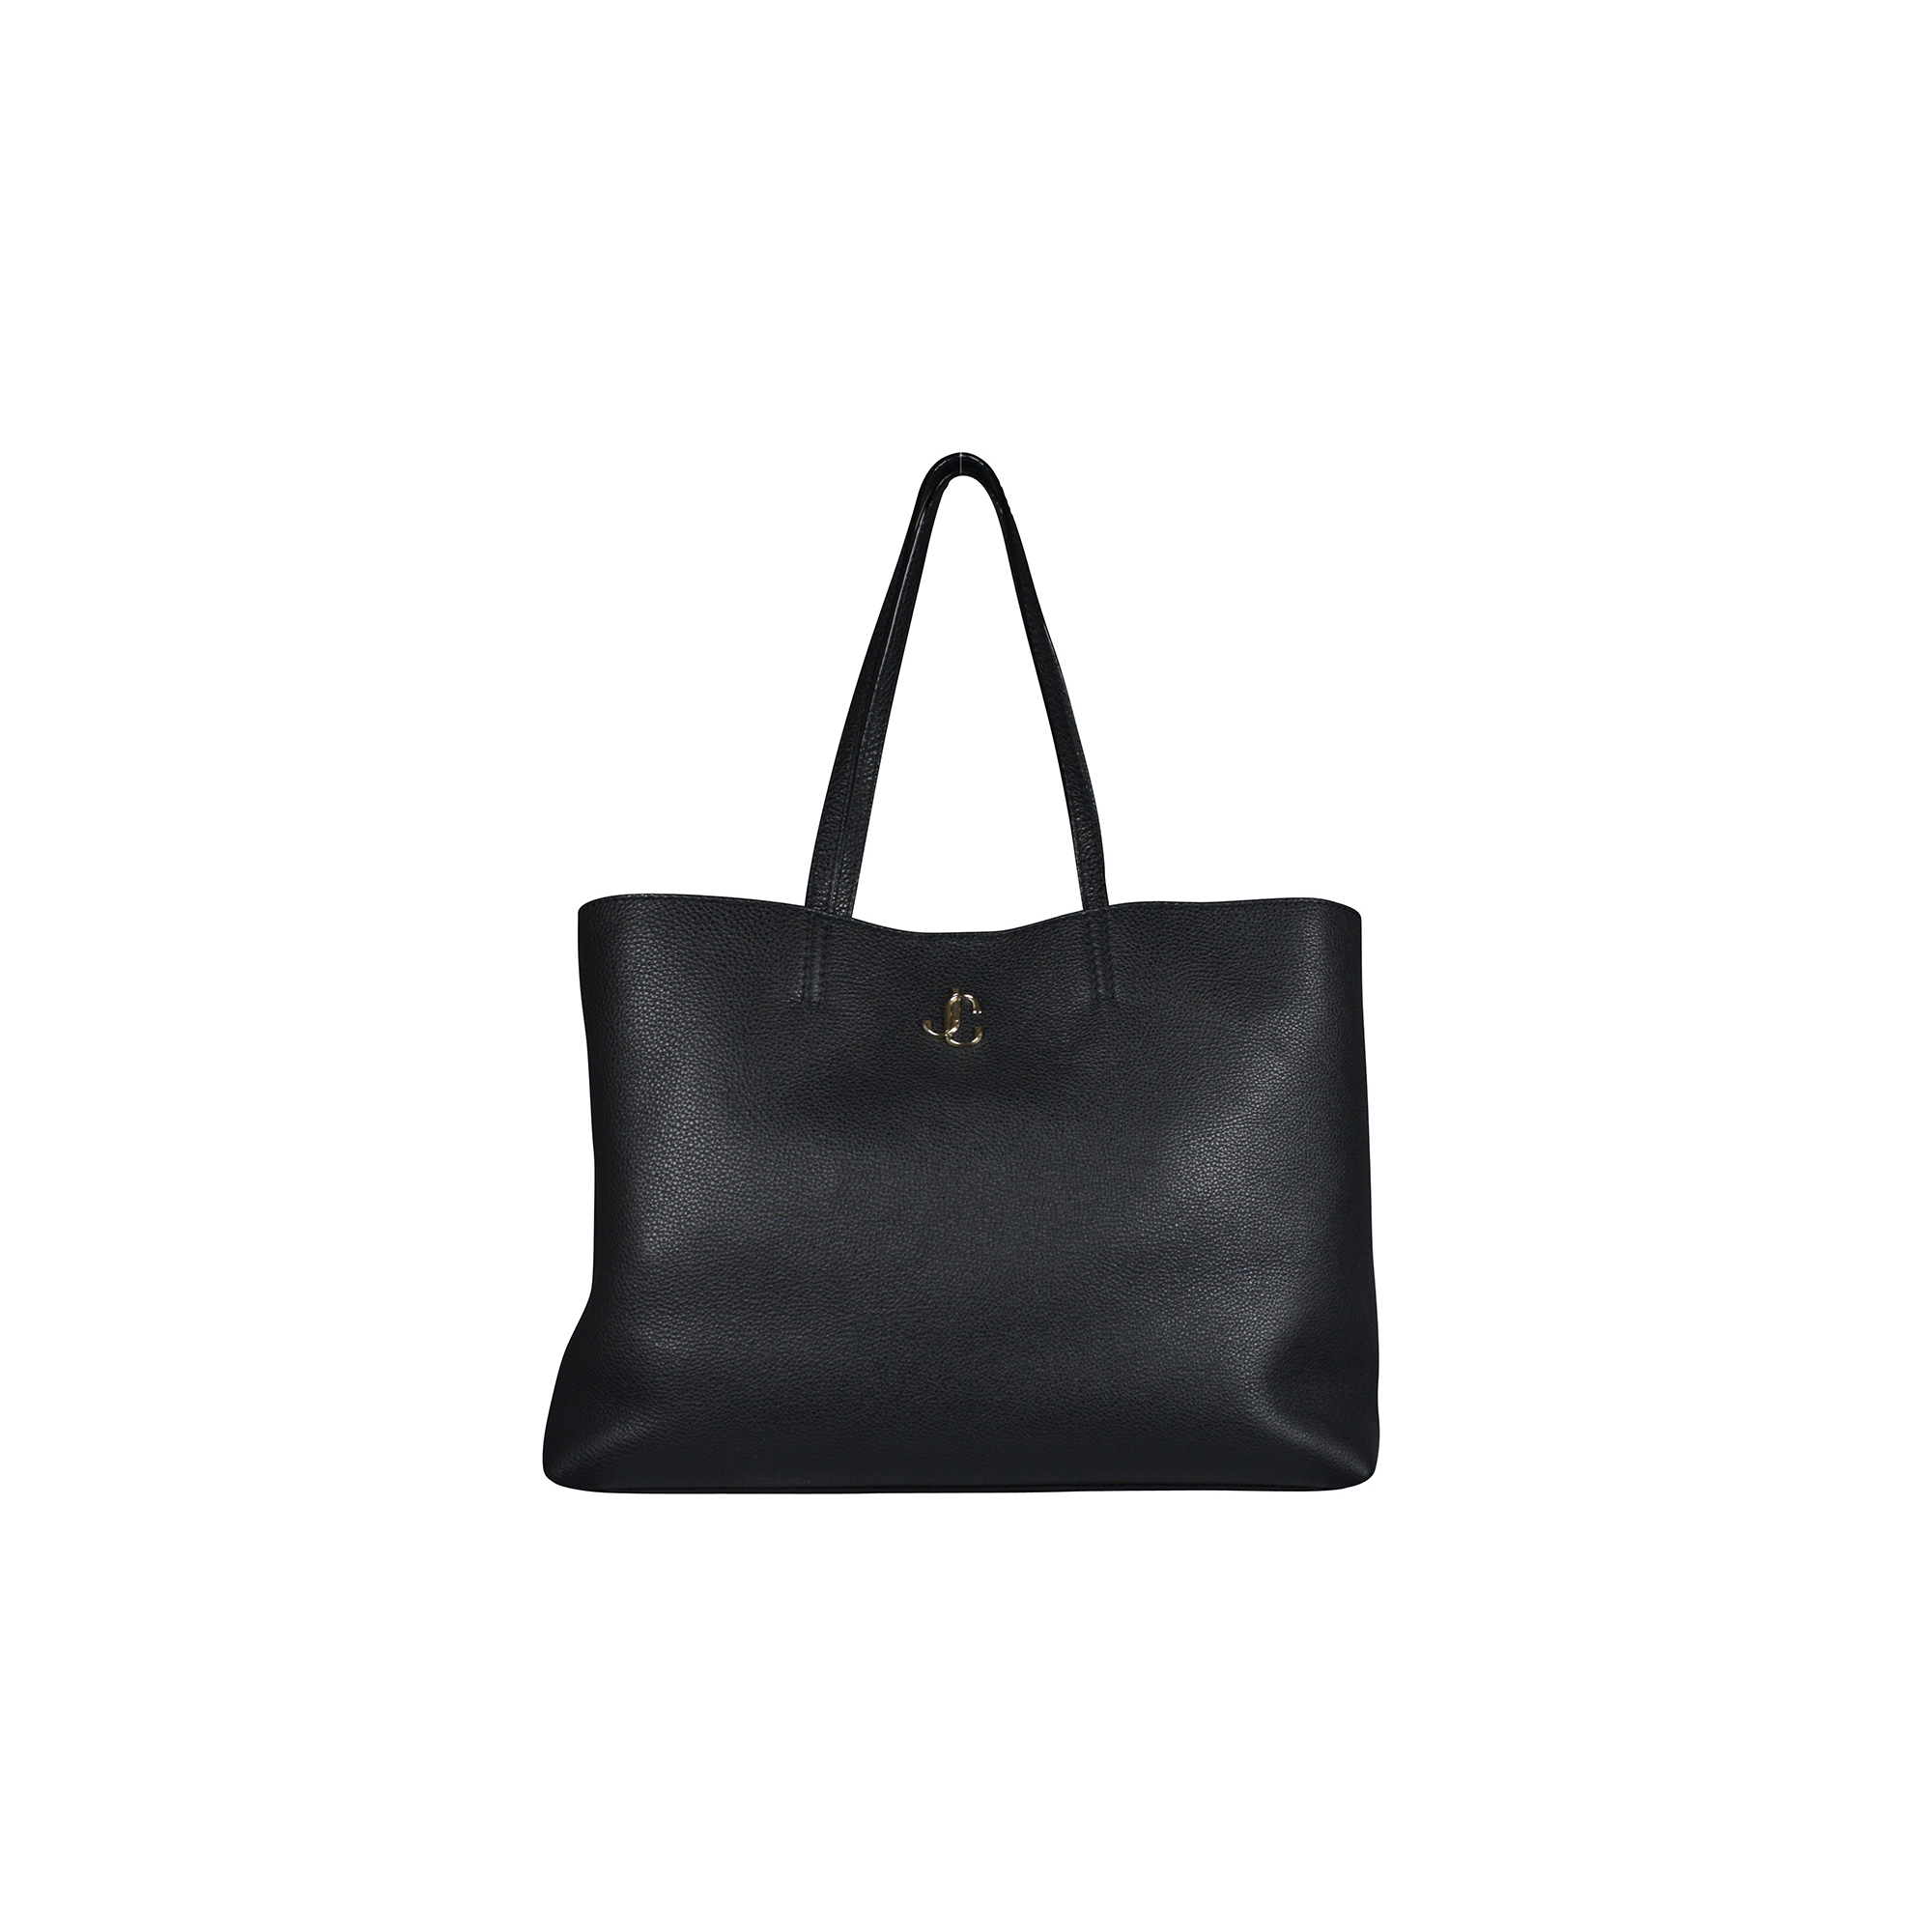 Nine2five Jimmy Choo handbag in black grained leather.